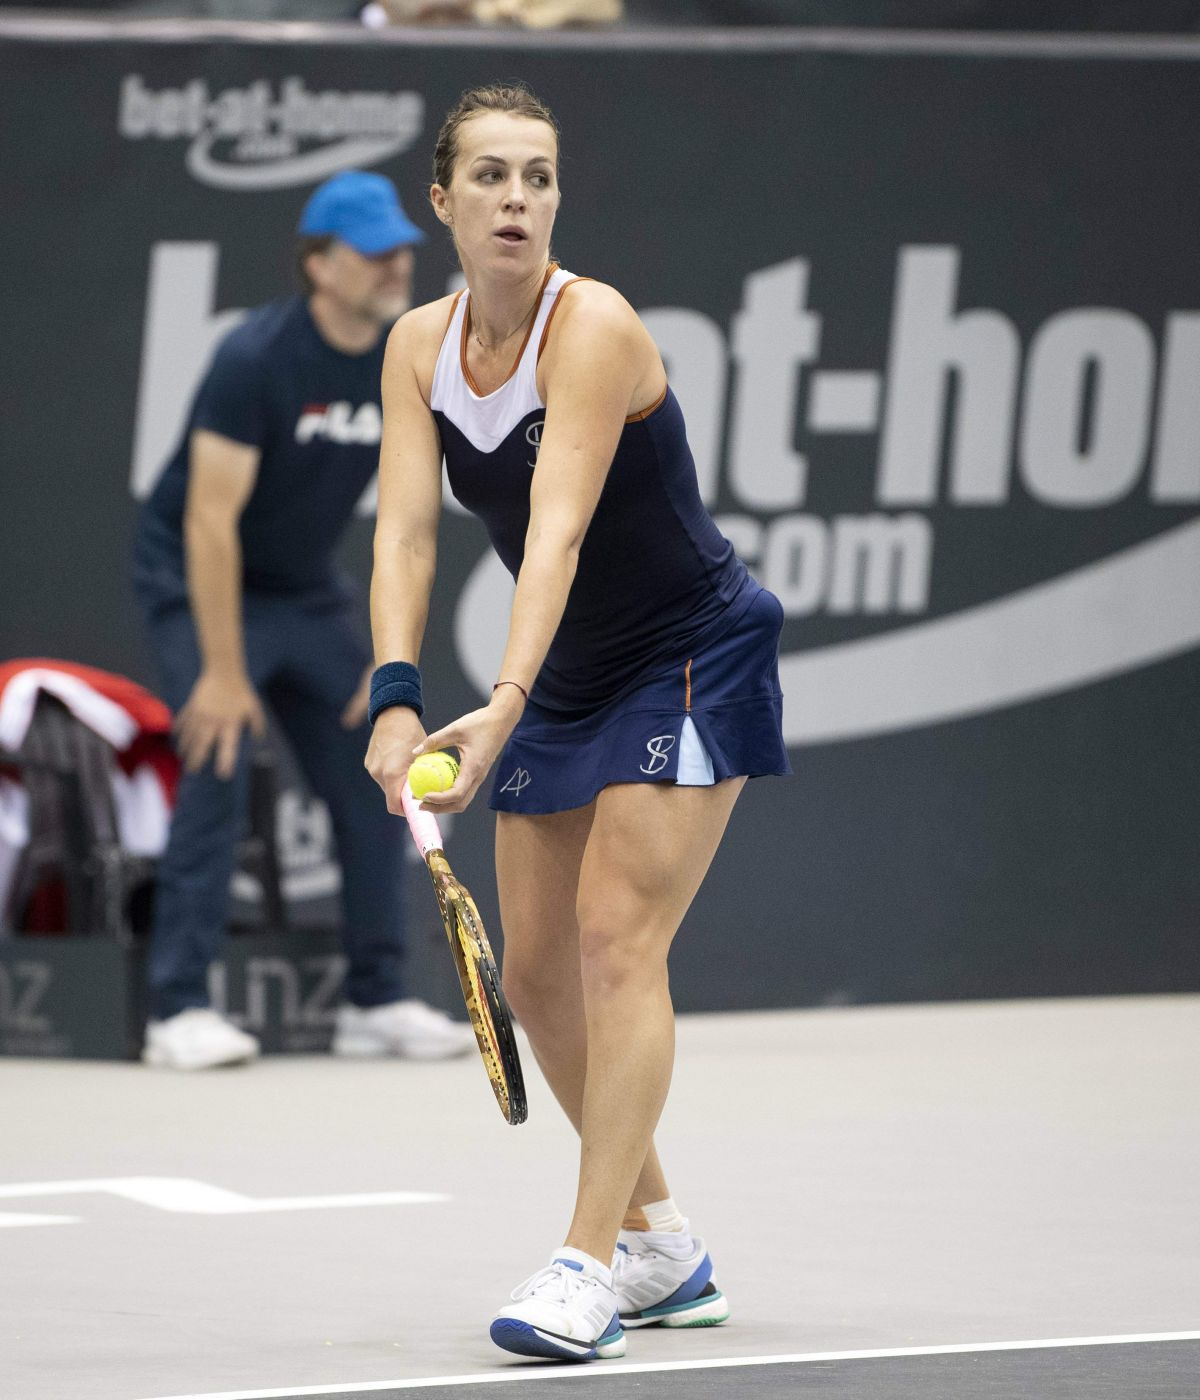 ANASTASIA PAVLYUCHENKOVA at WTA Upper Austria Ladies Tennins Tournament in  Linz 10/10/2018 – HawtCelebs